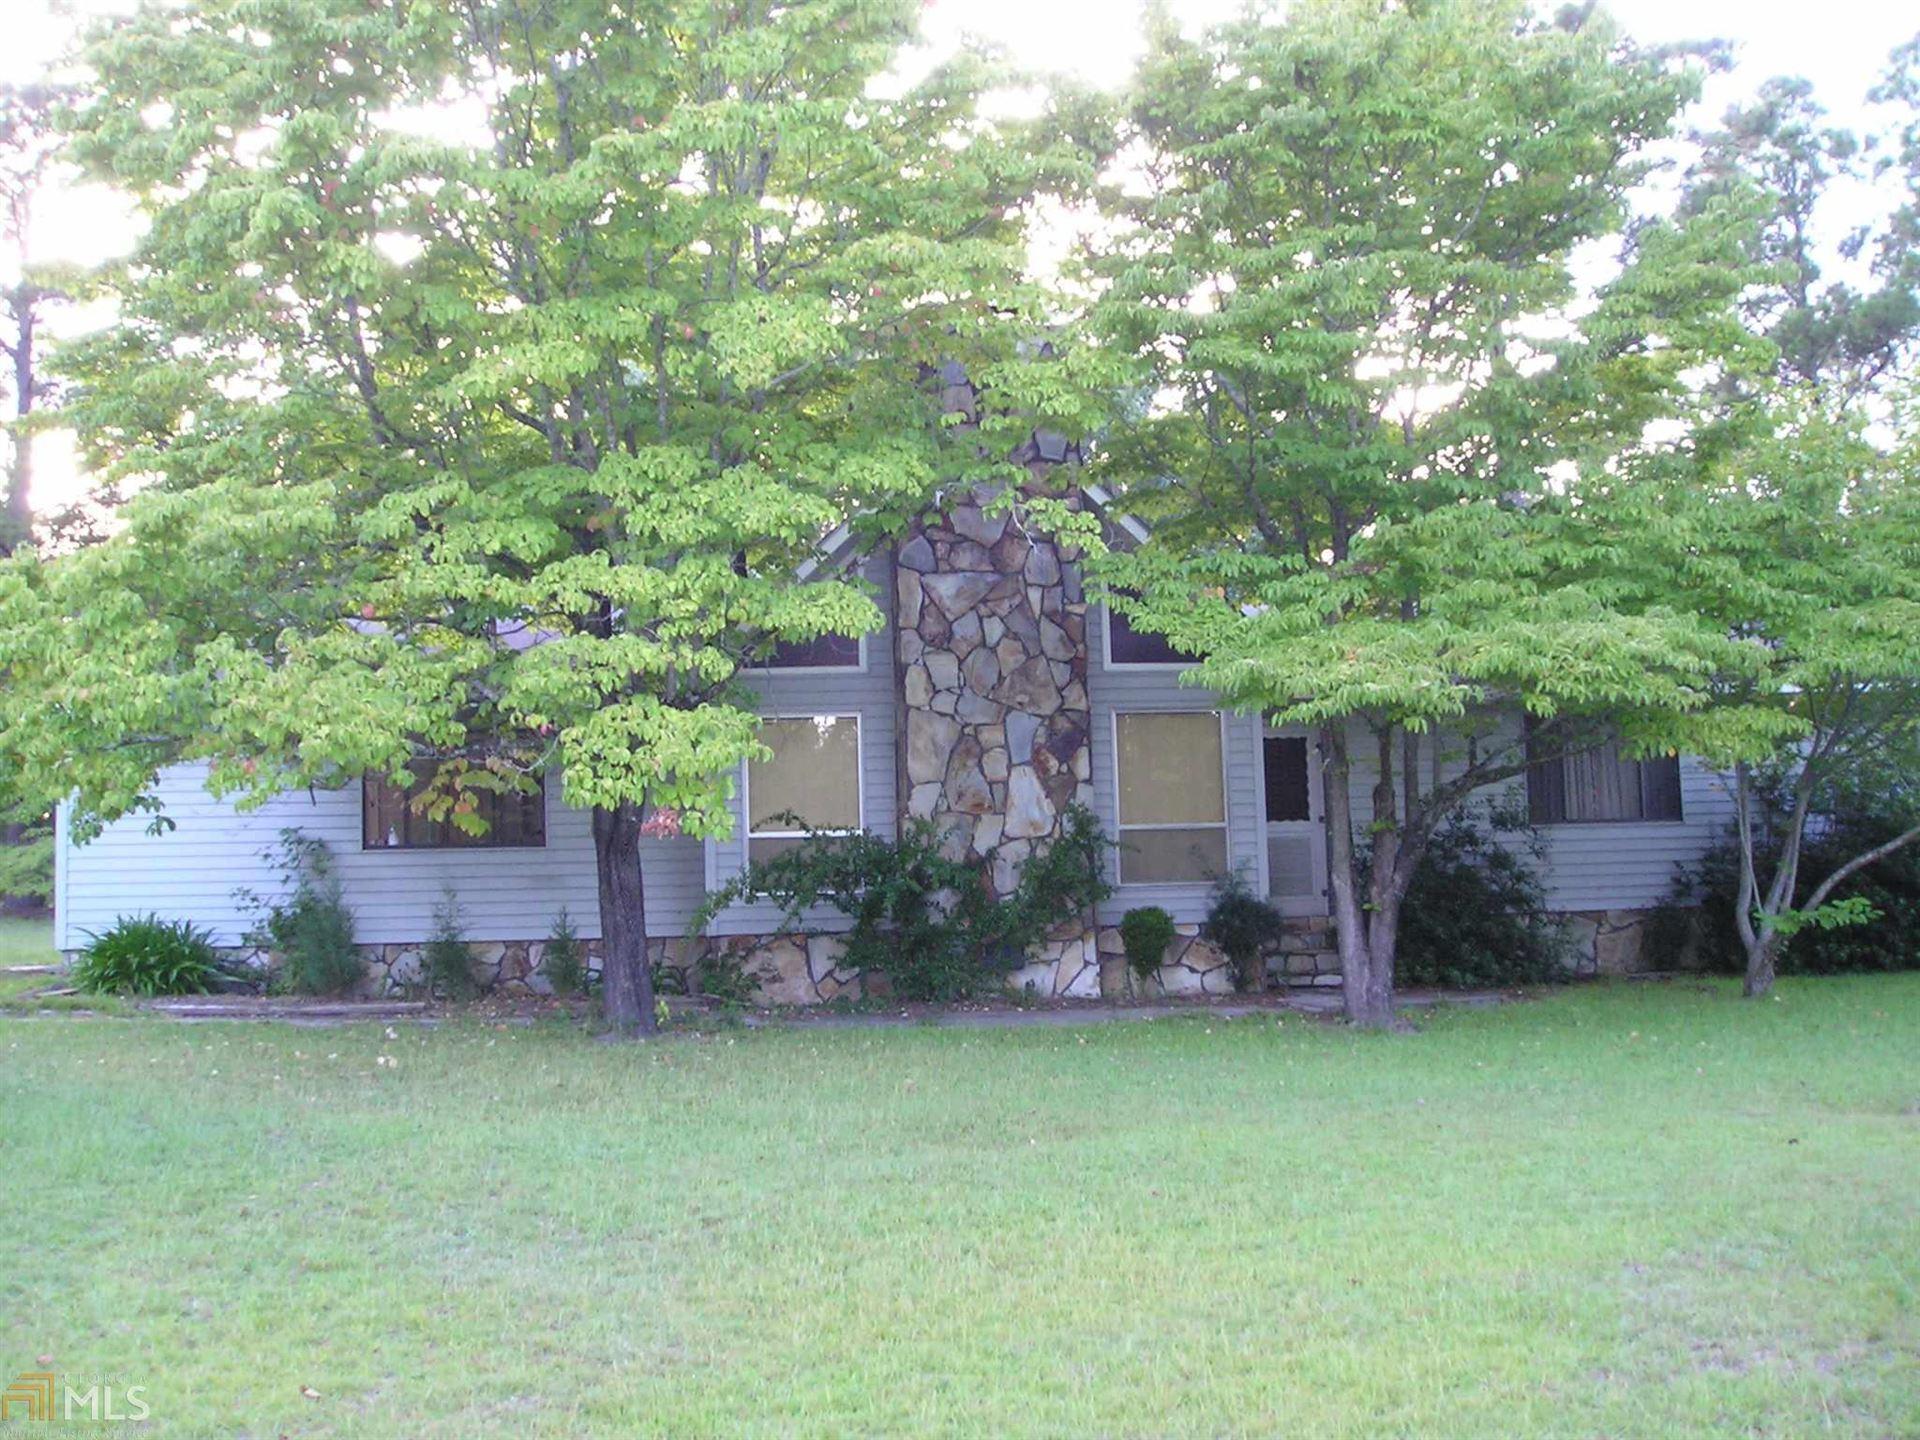 201 Peg Wen Blvd, Statesboro, GA 30461 - #: 8845745